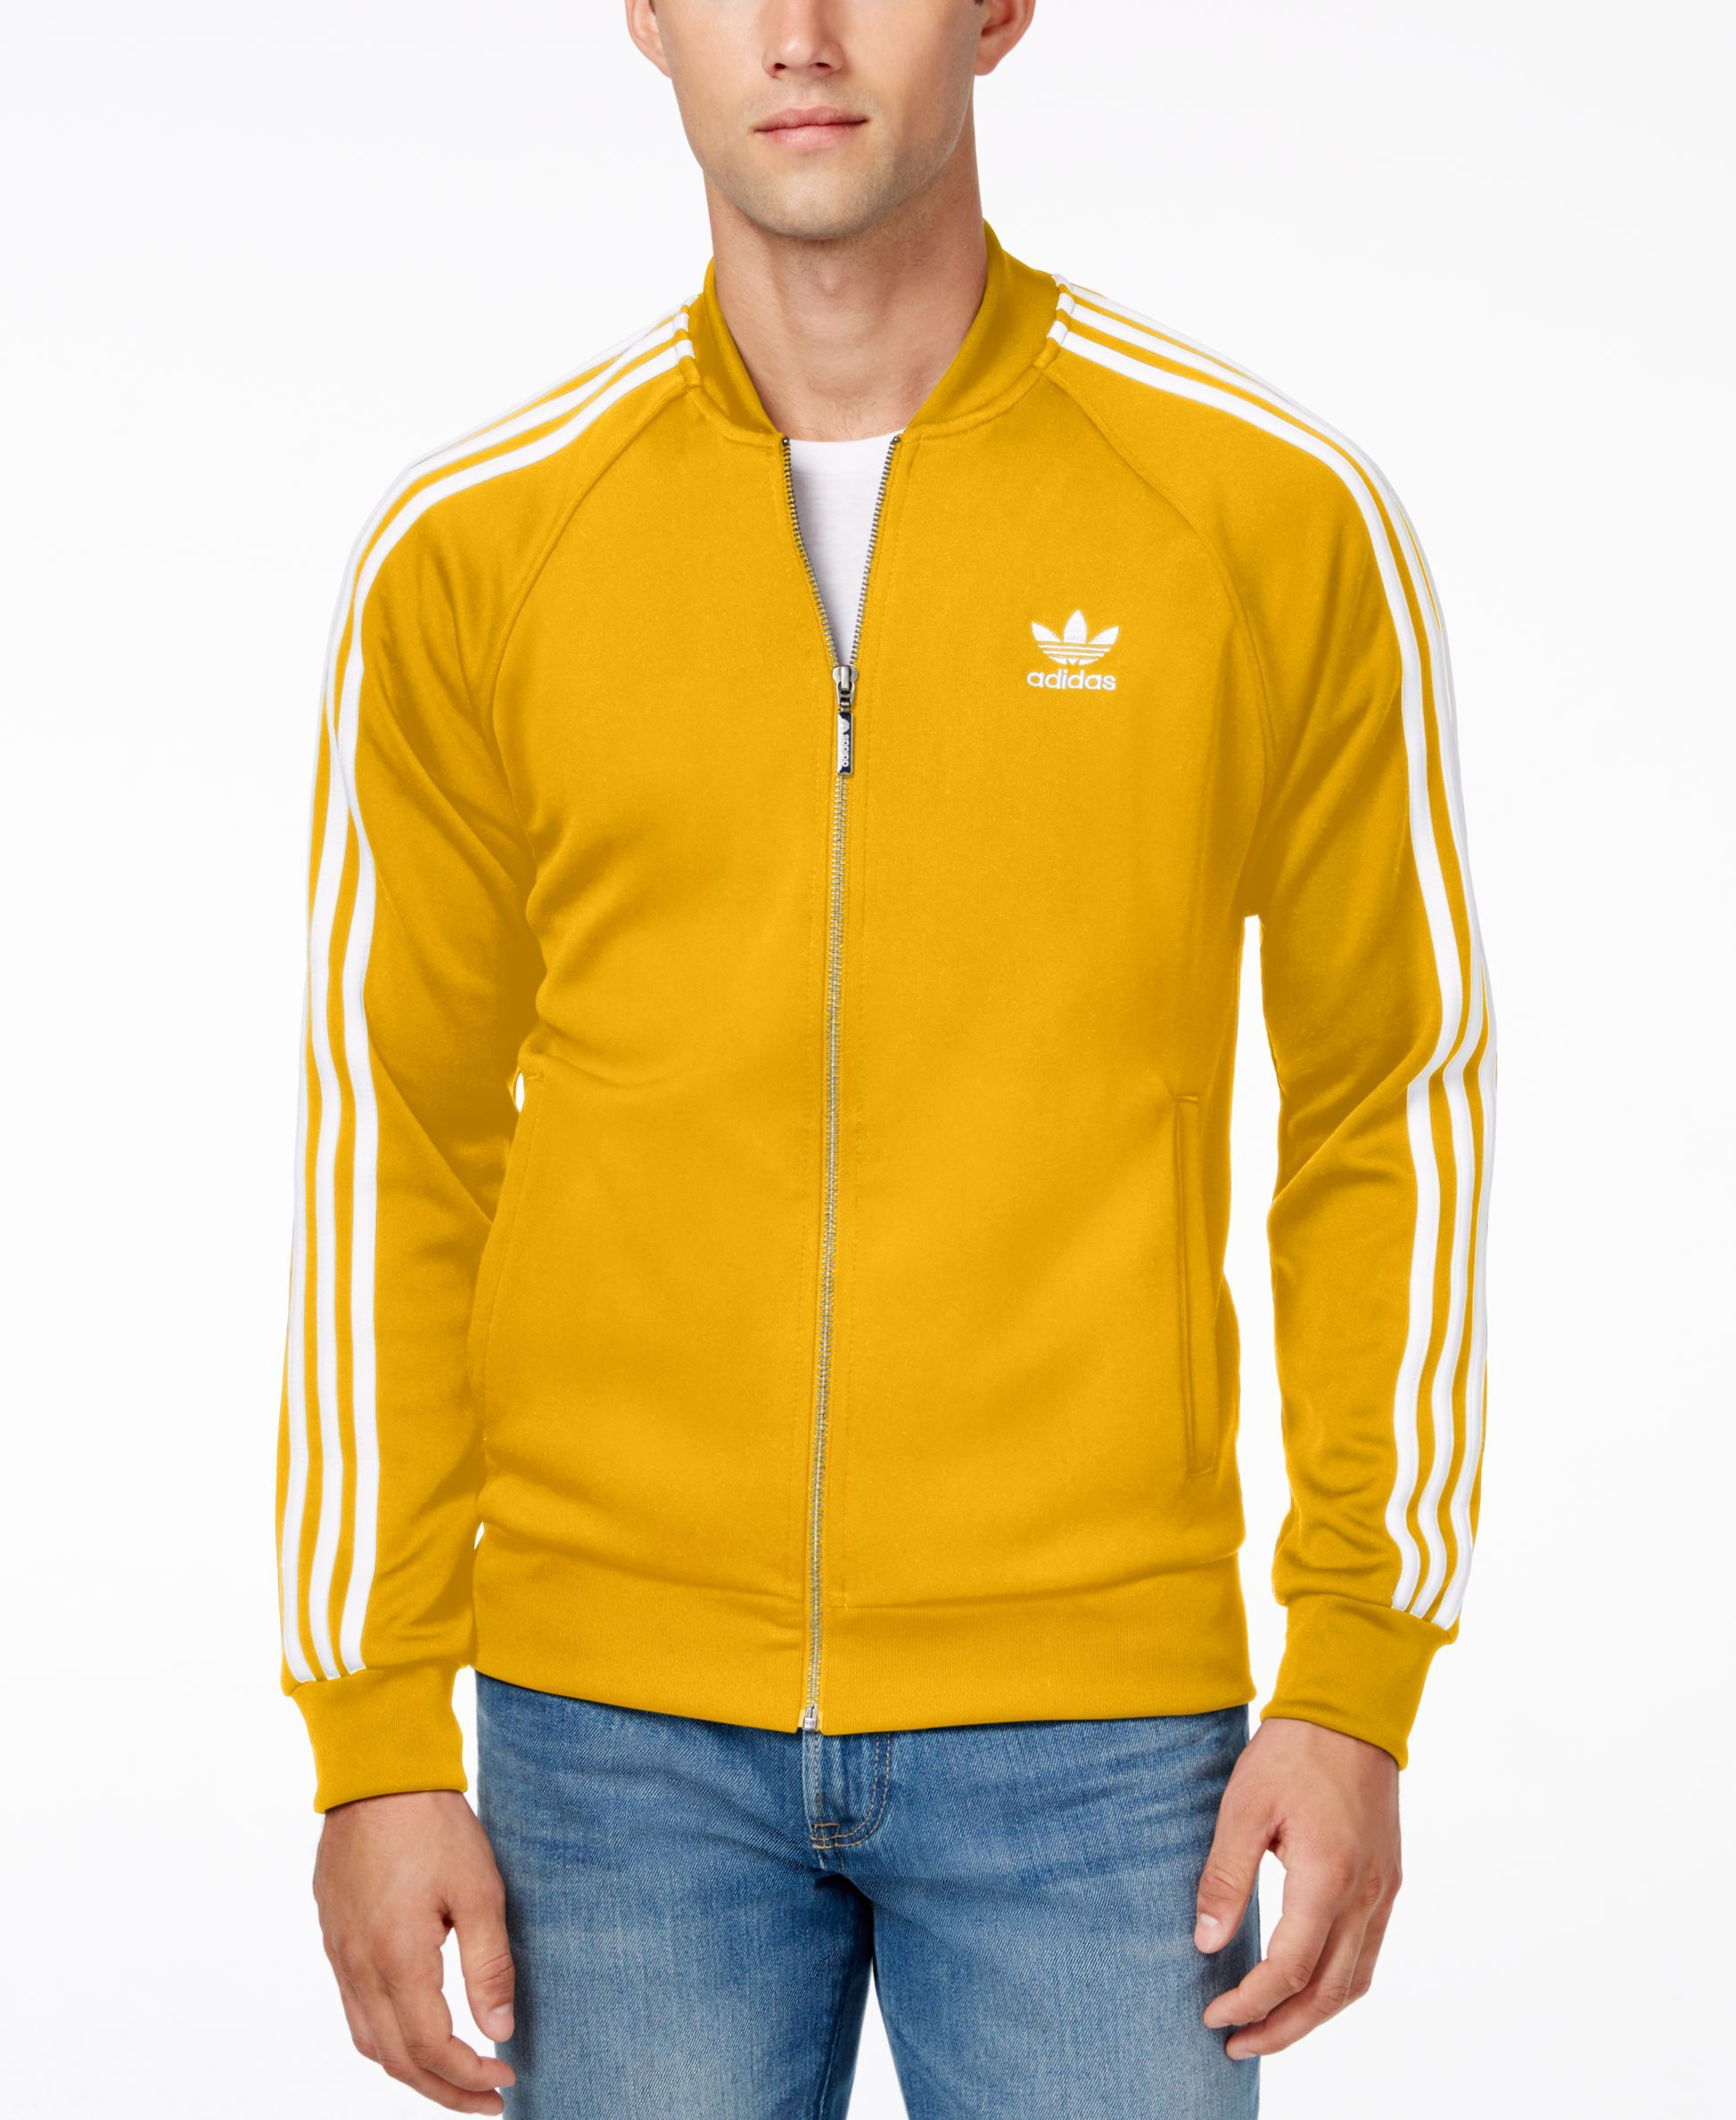 44e3f1feab5 adidas Originals Men's Superstar Zippered Track Jacket Yellow Adidas,  Adidas Jacket, Yellow Coat,